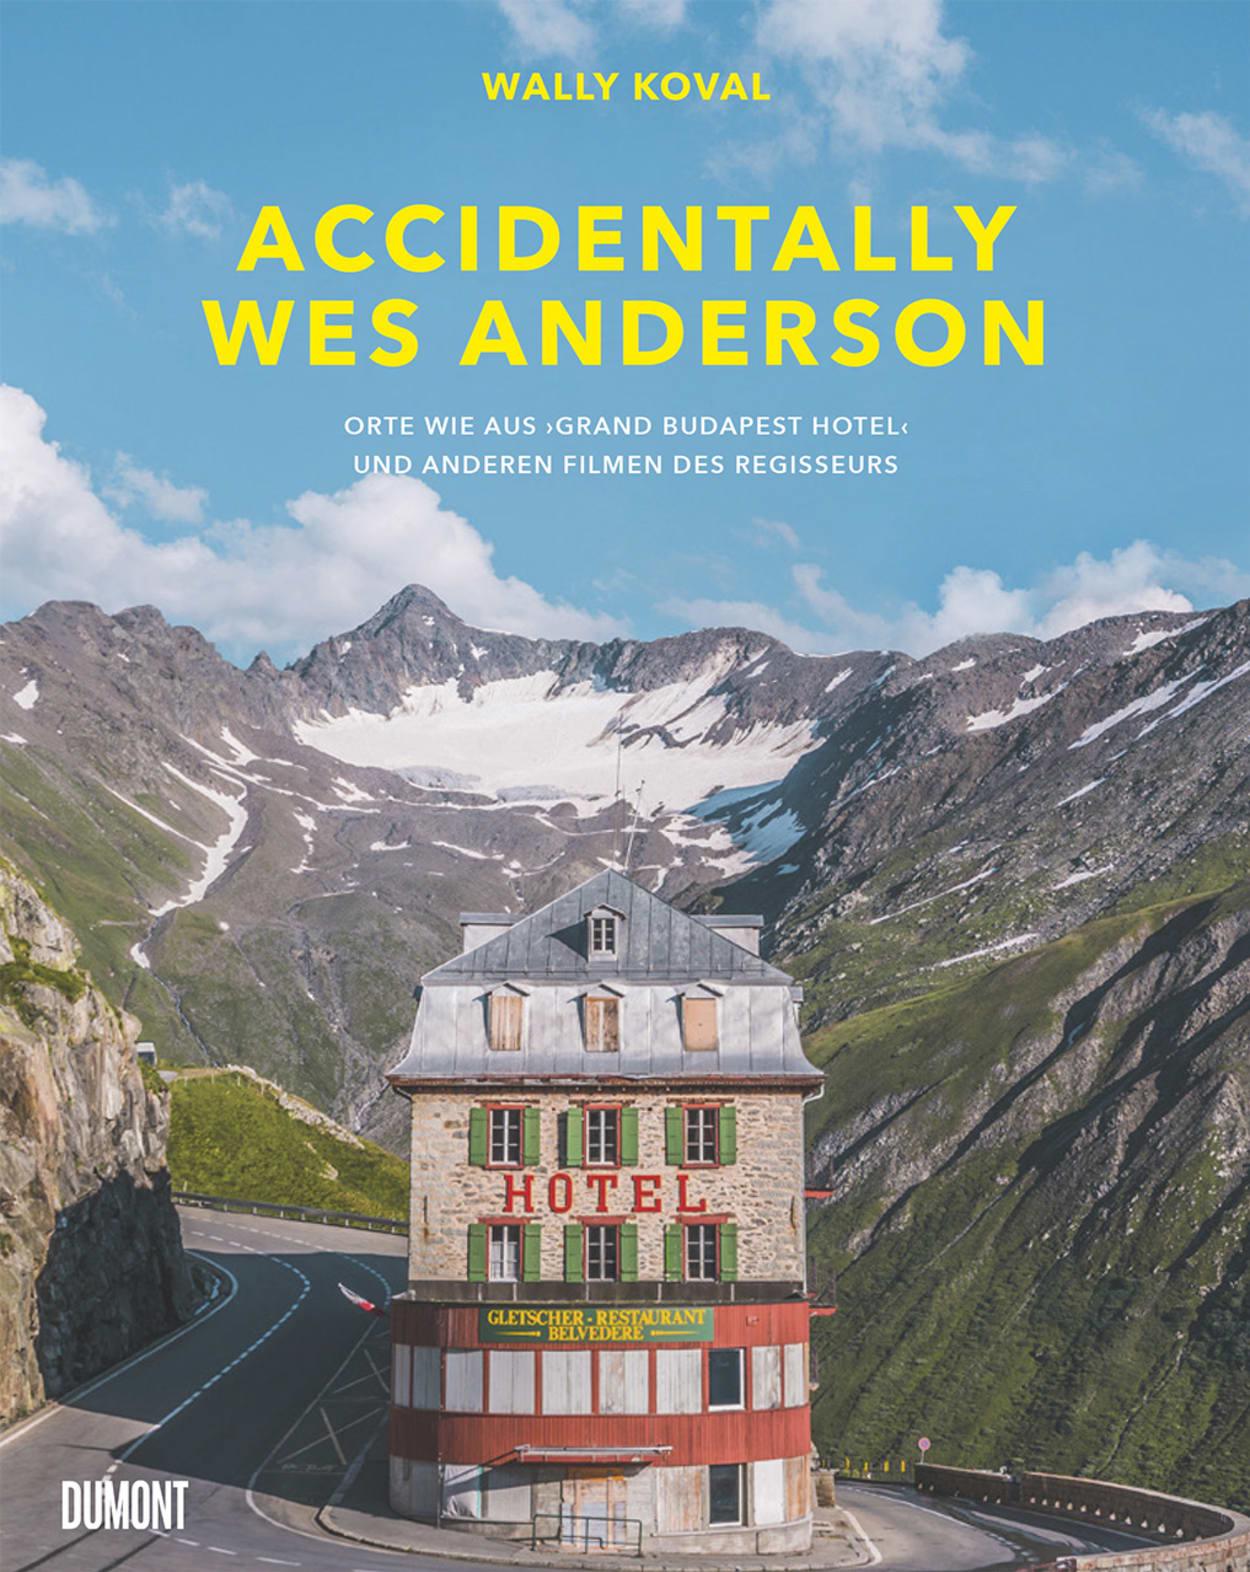 Kultbuch, Wes Anderson, Filmkulisse